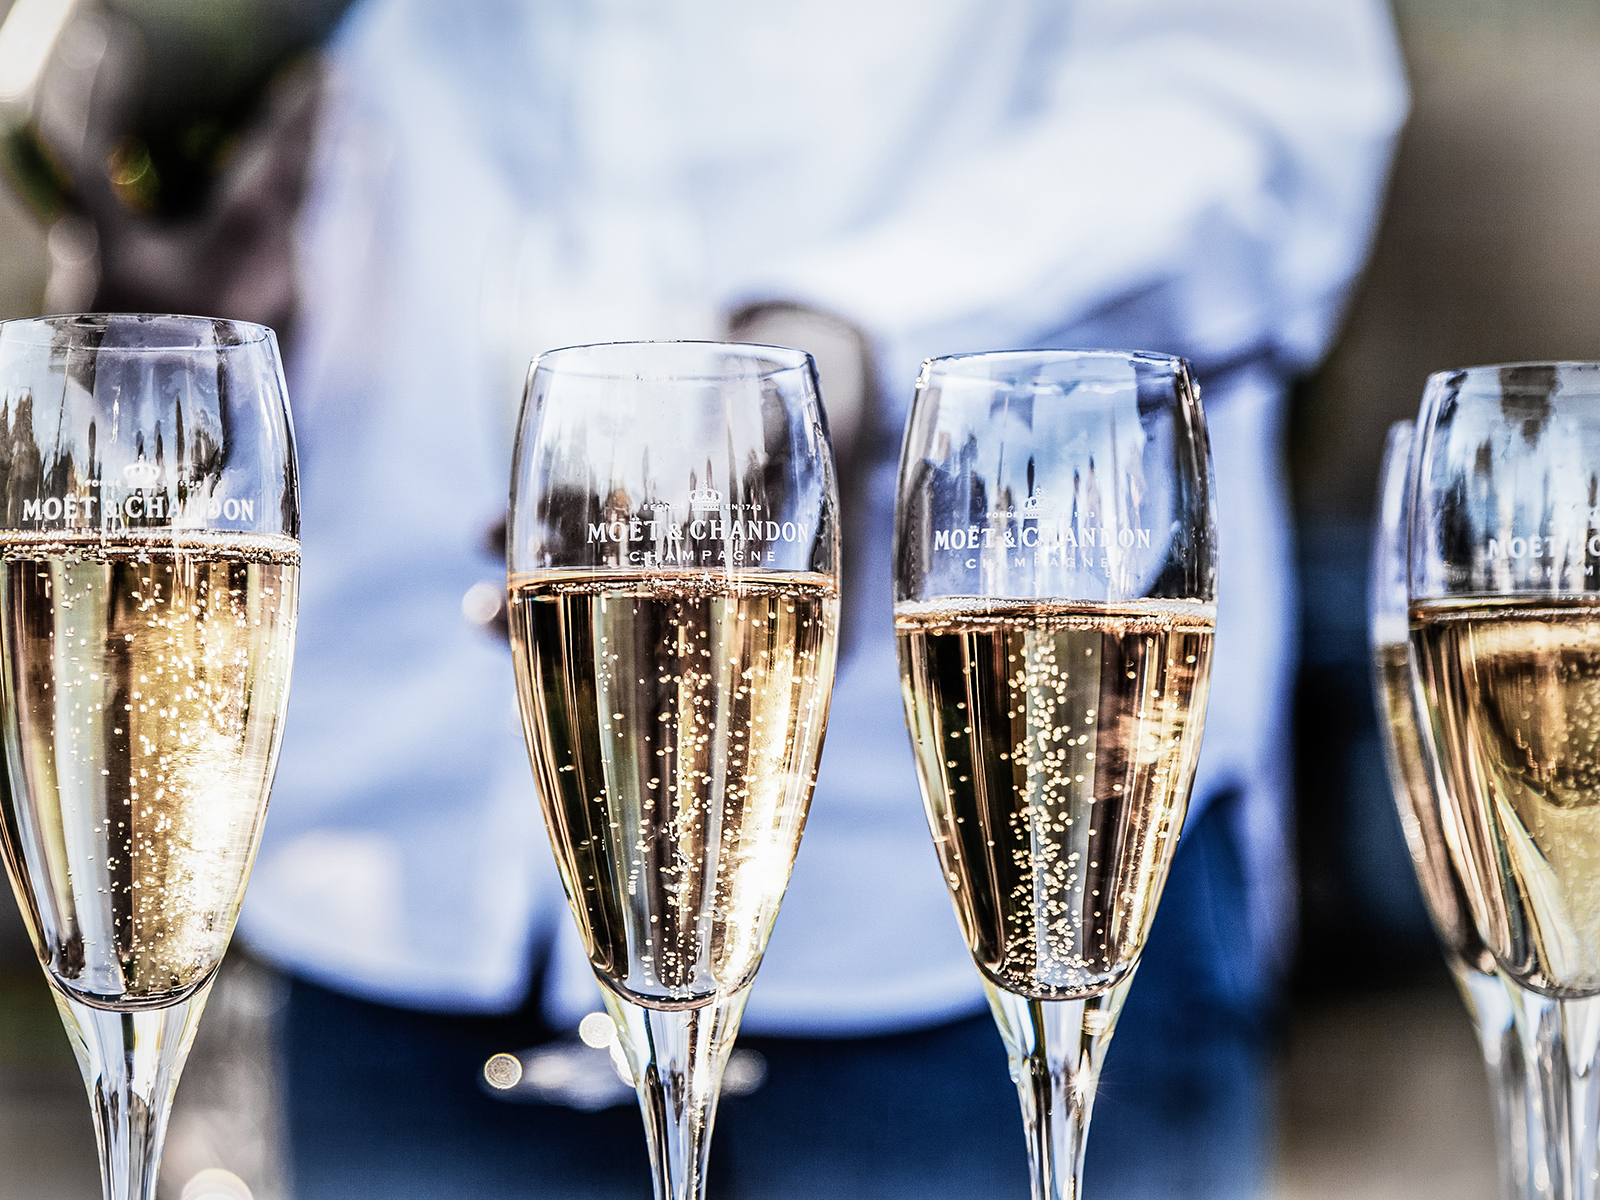 Tulip shaped champagne glasses